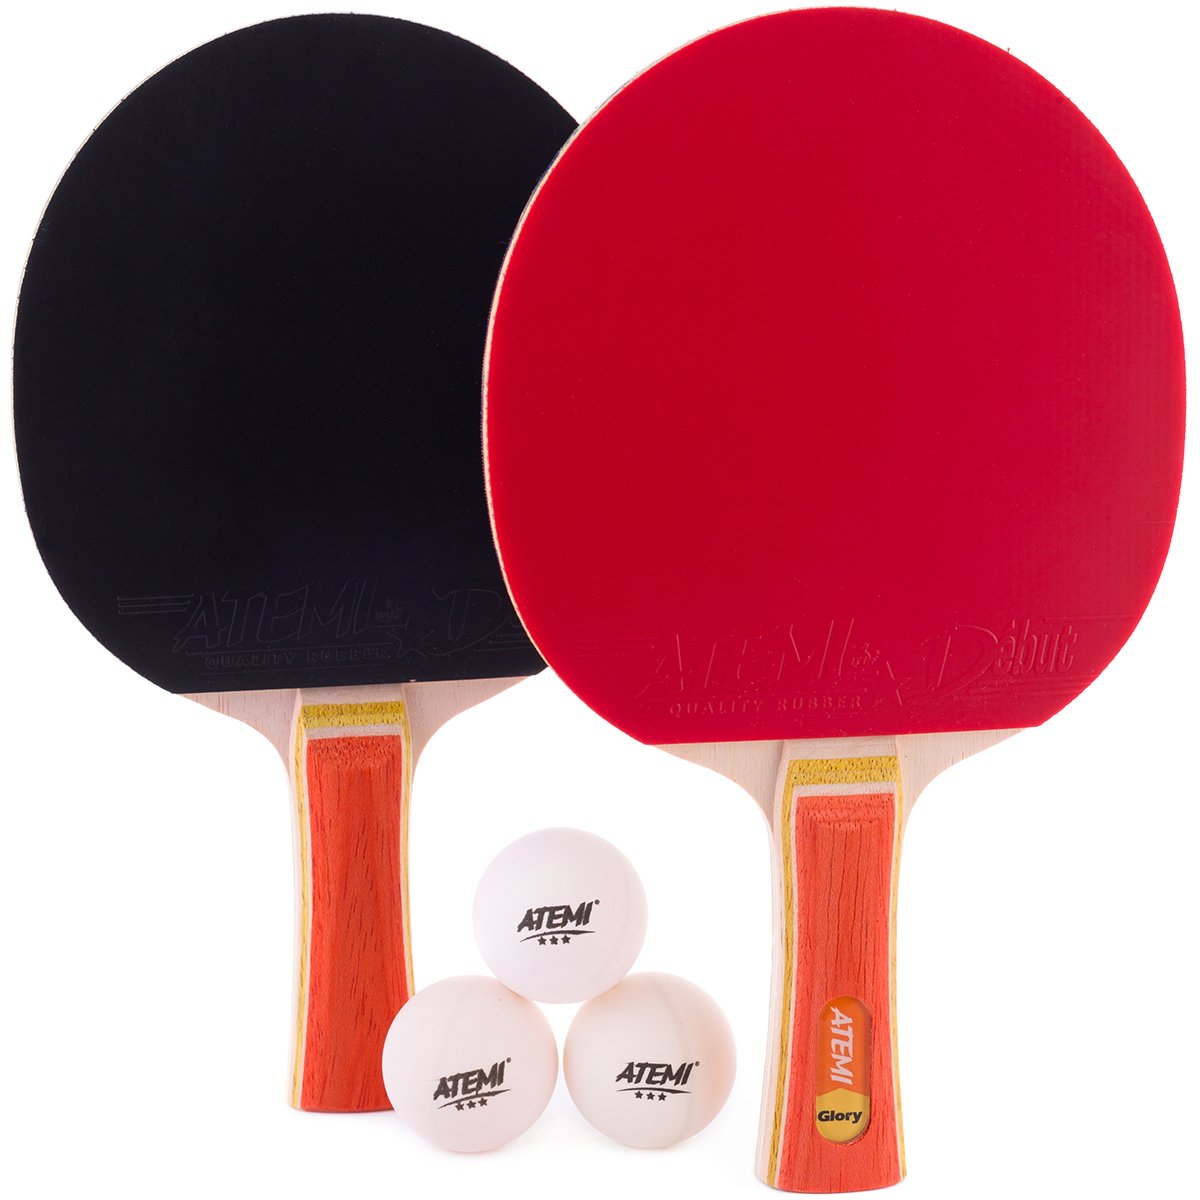 Atemi Sniper 5-Star Table Tennis Bat Bundle  (3-Piece Set ) 5-Ply Ping Pong  Racket ... 9c11cb355c681